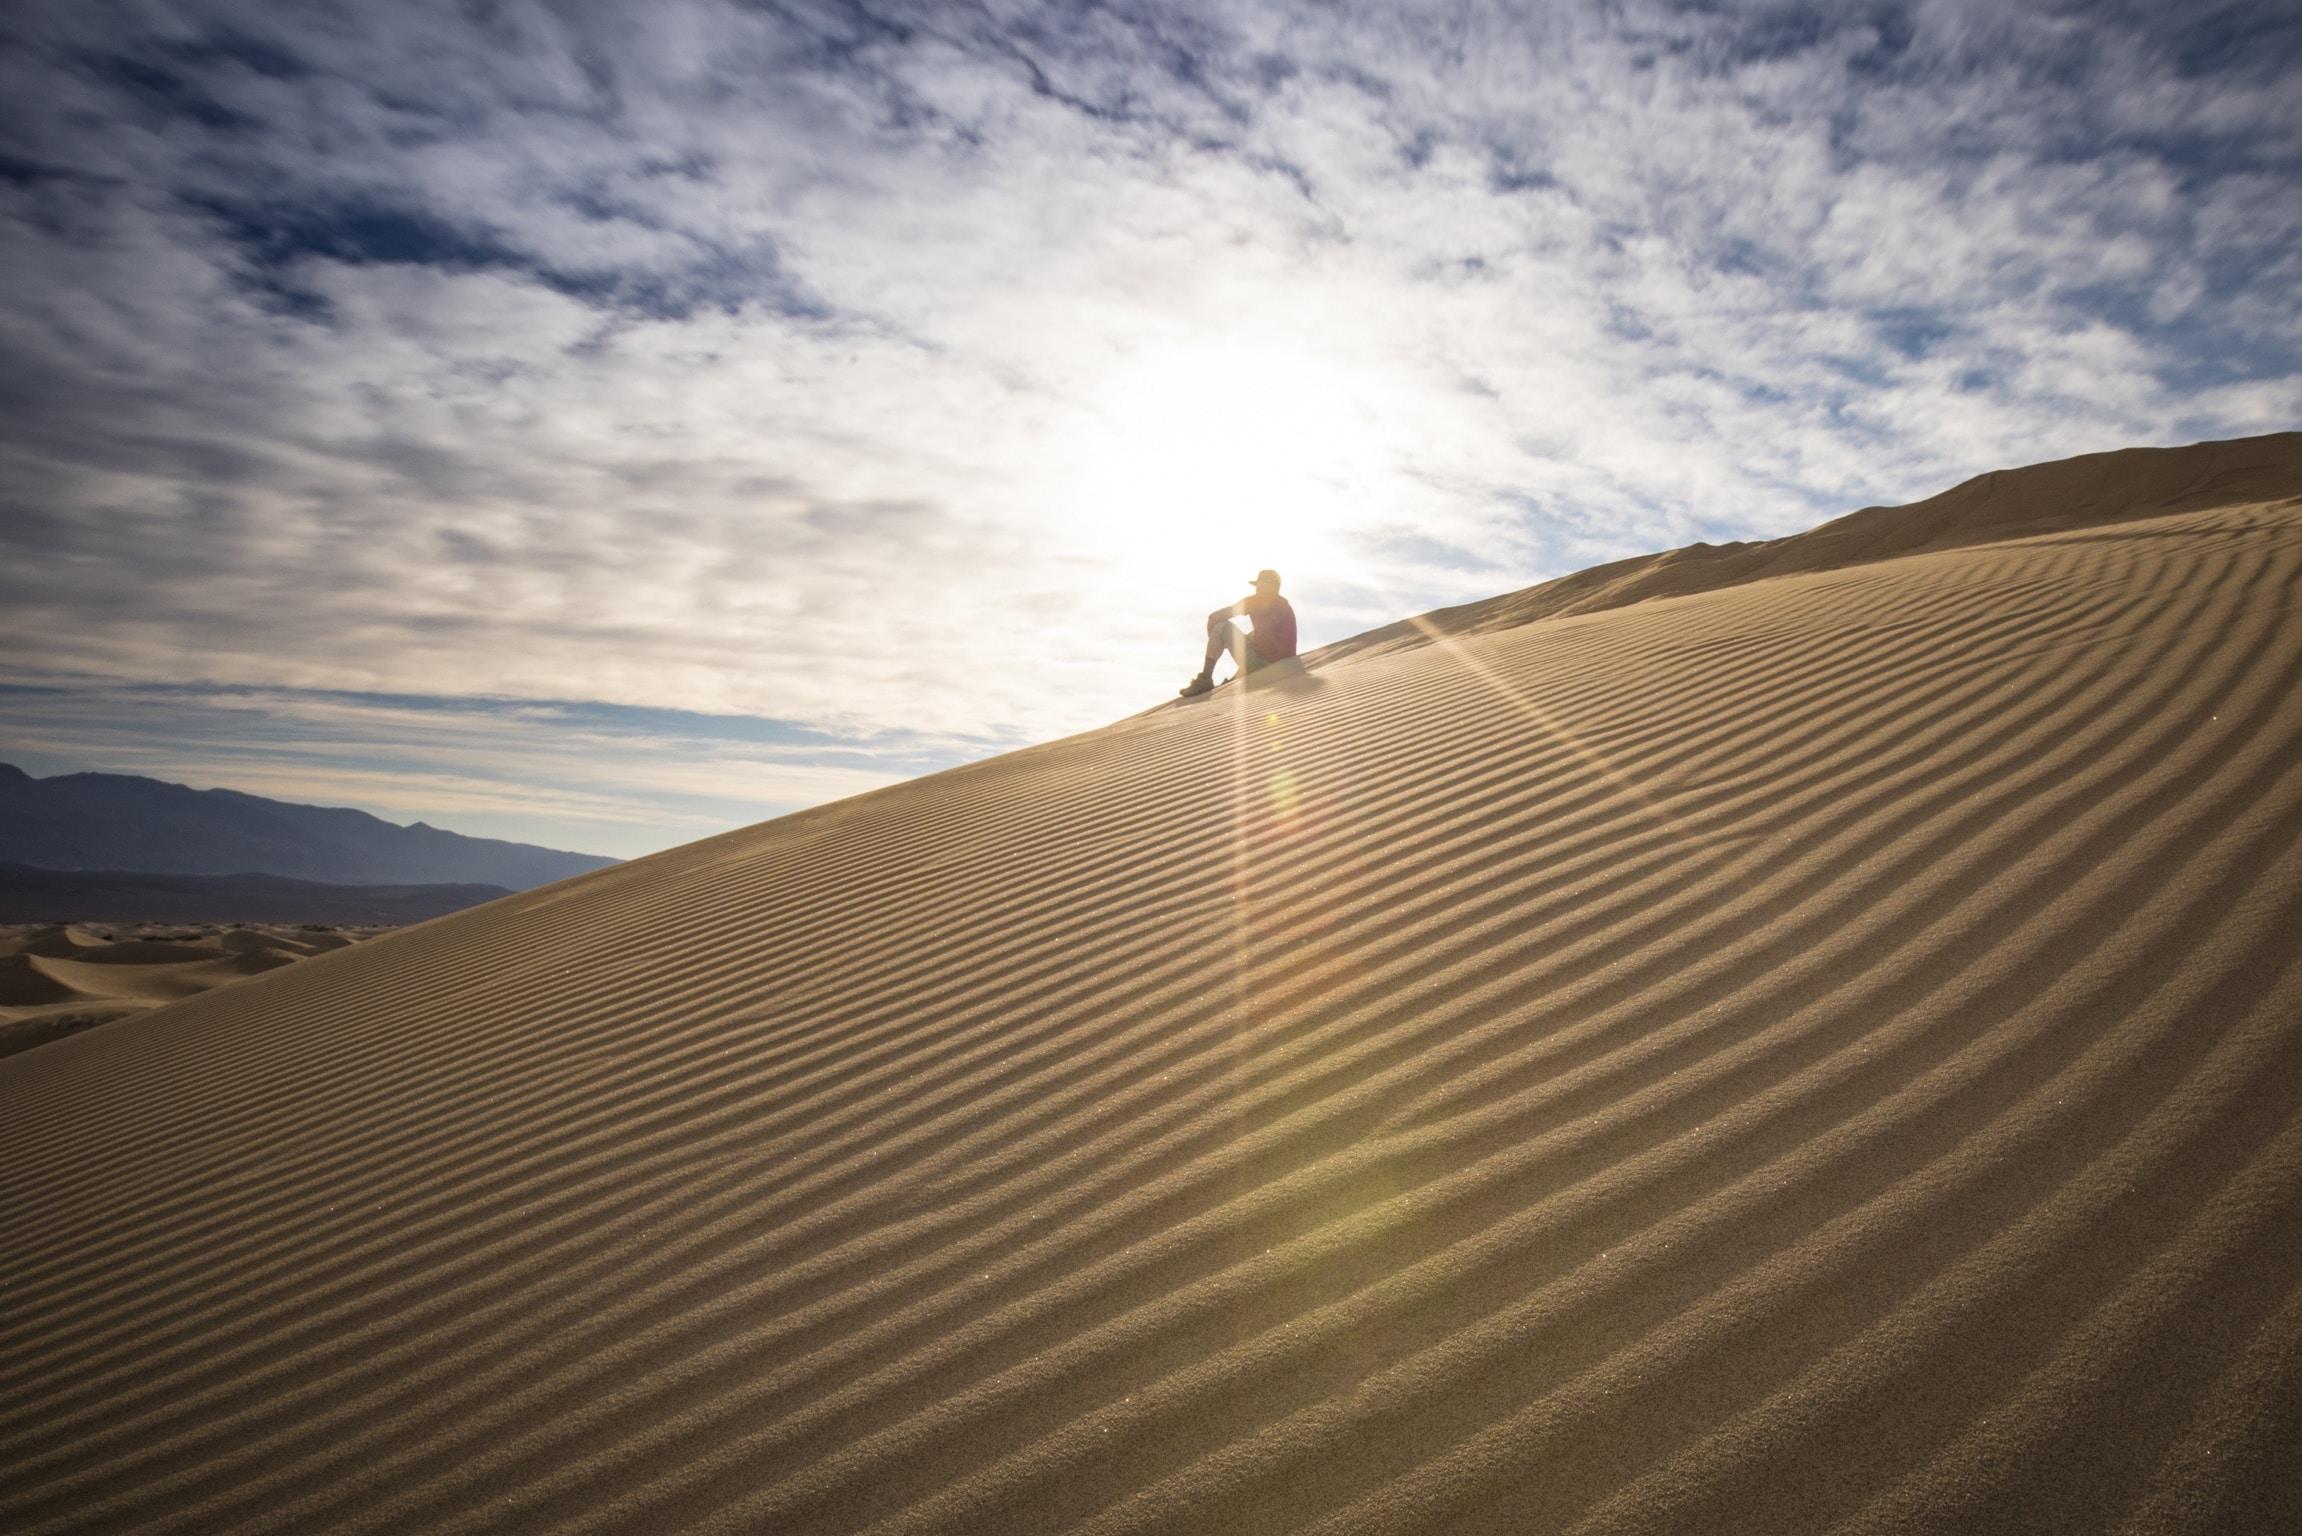 person sitting on desert during daytime